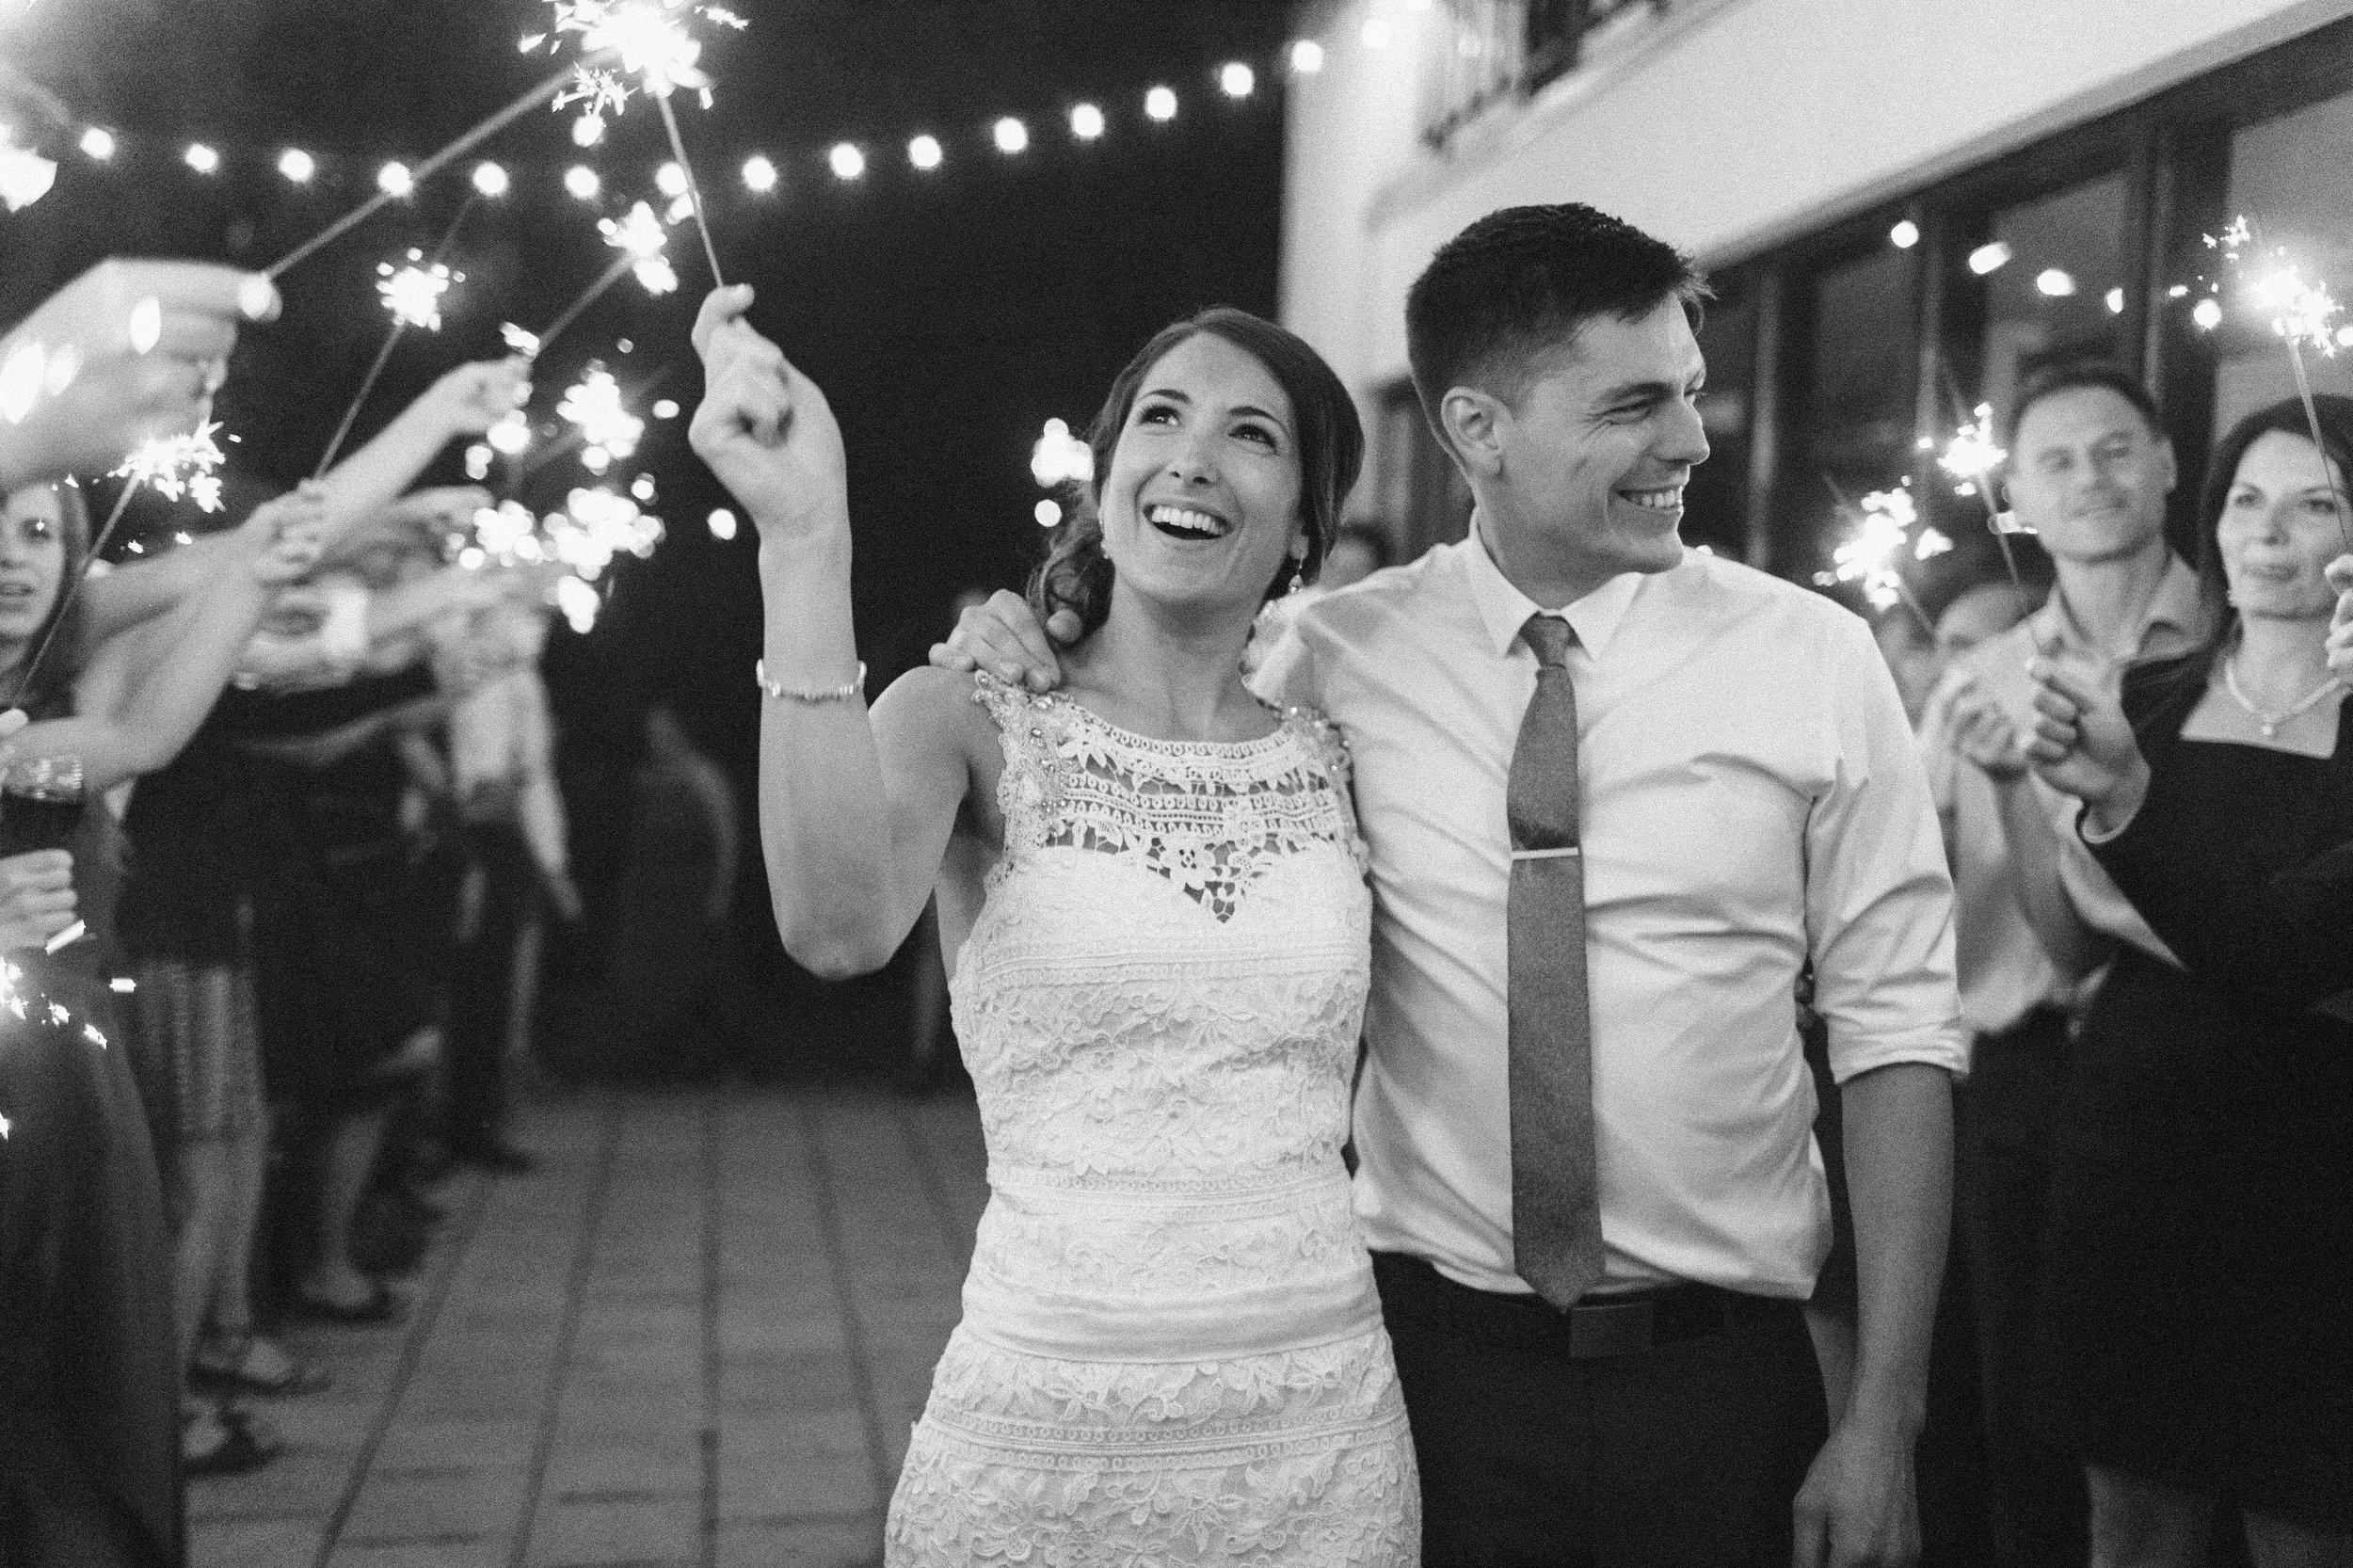 montreal-wedding-photographer-richelle-hunter-lisa-renault-simon-1014.jpg